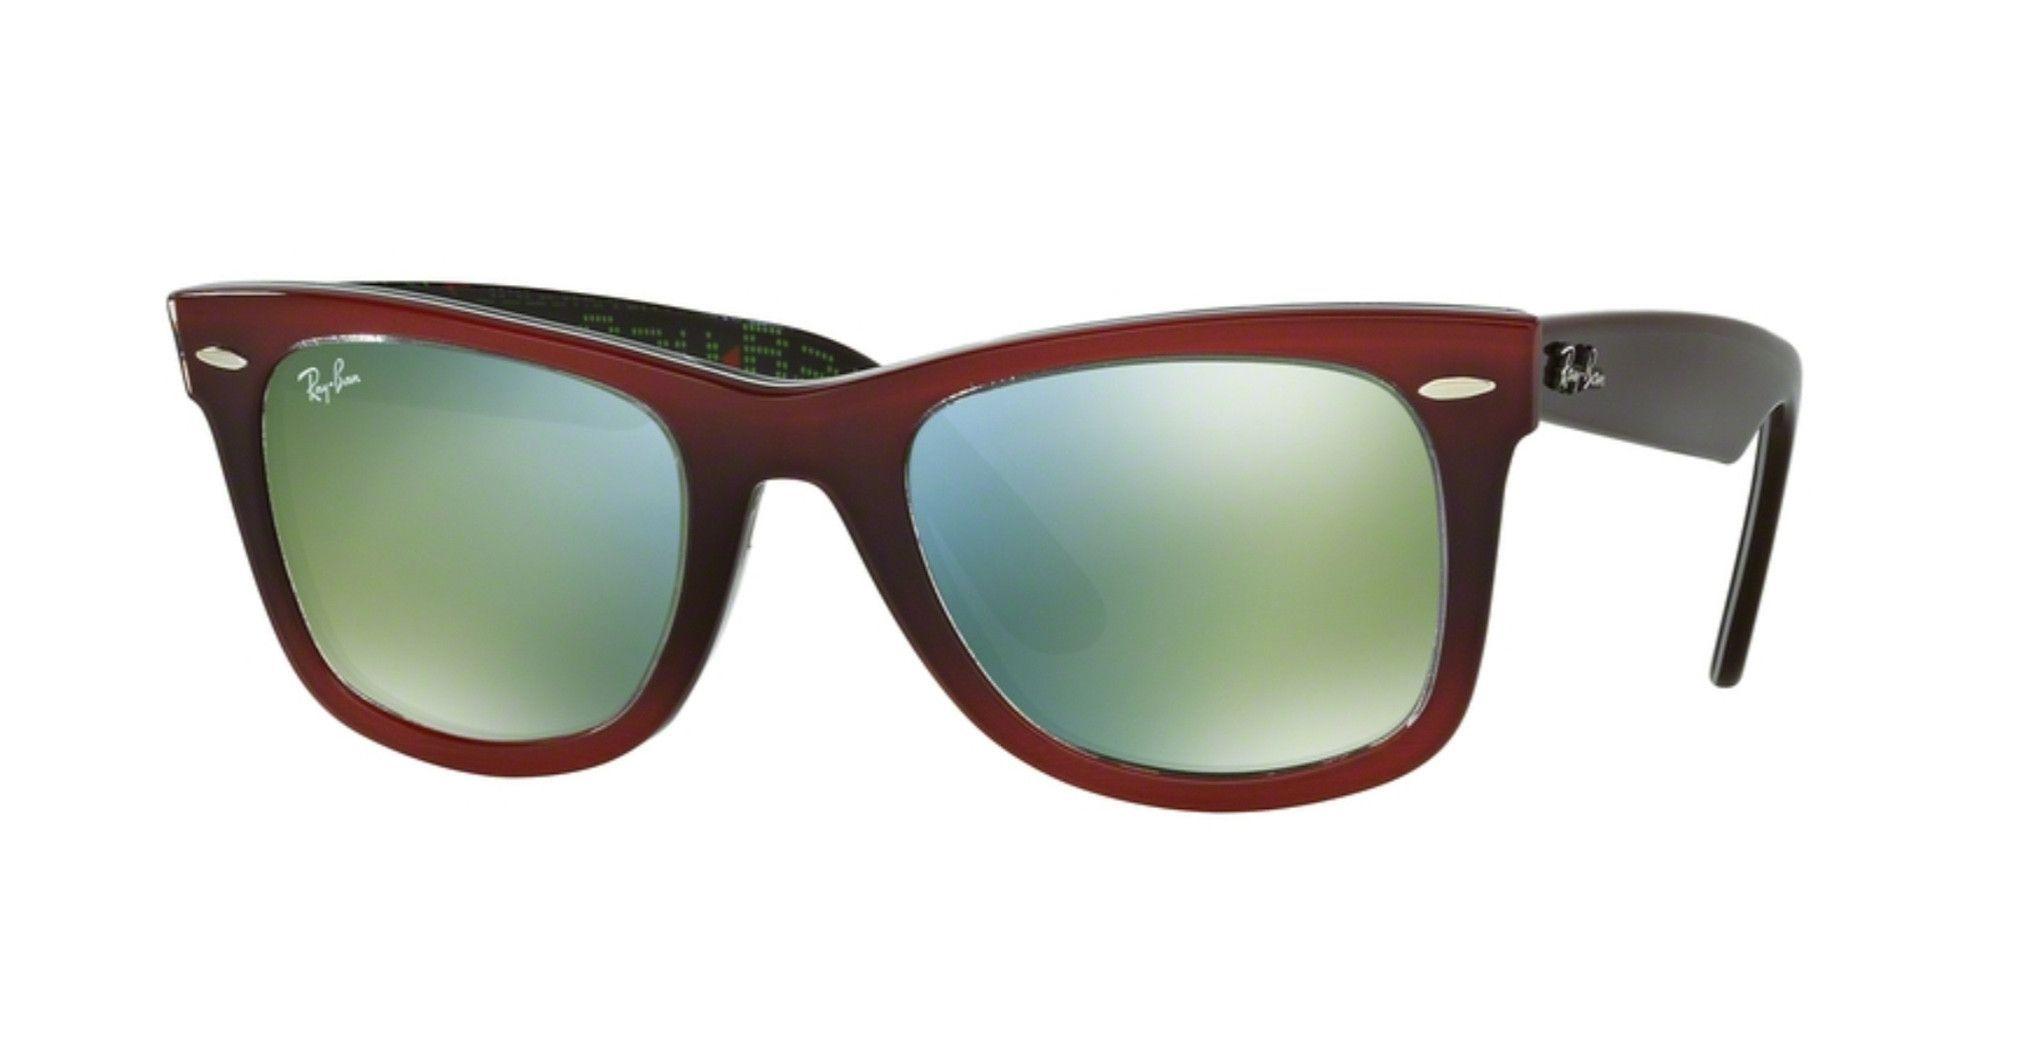 b61a3bfab1f0d Ray-Ban RB2140-12022X Gradient Red on Light Red Original Wayfarer Sunglasses